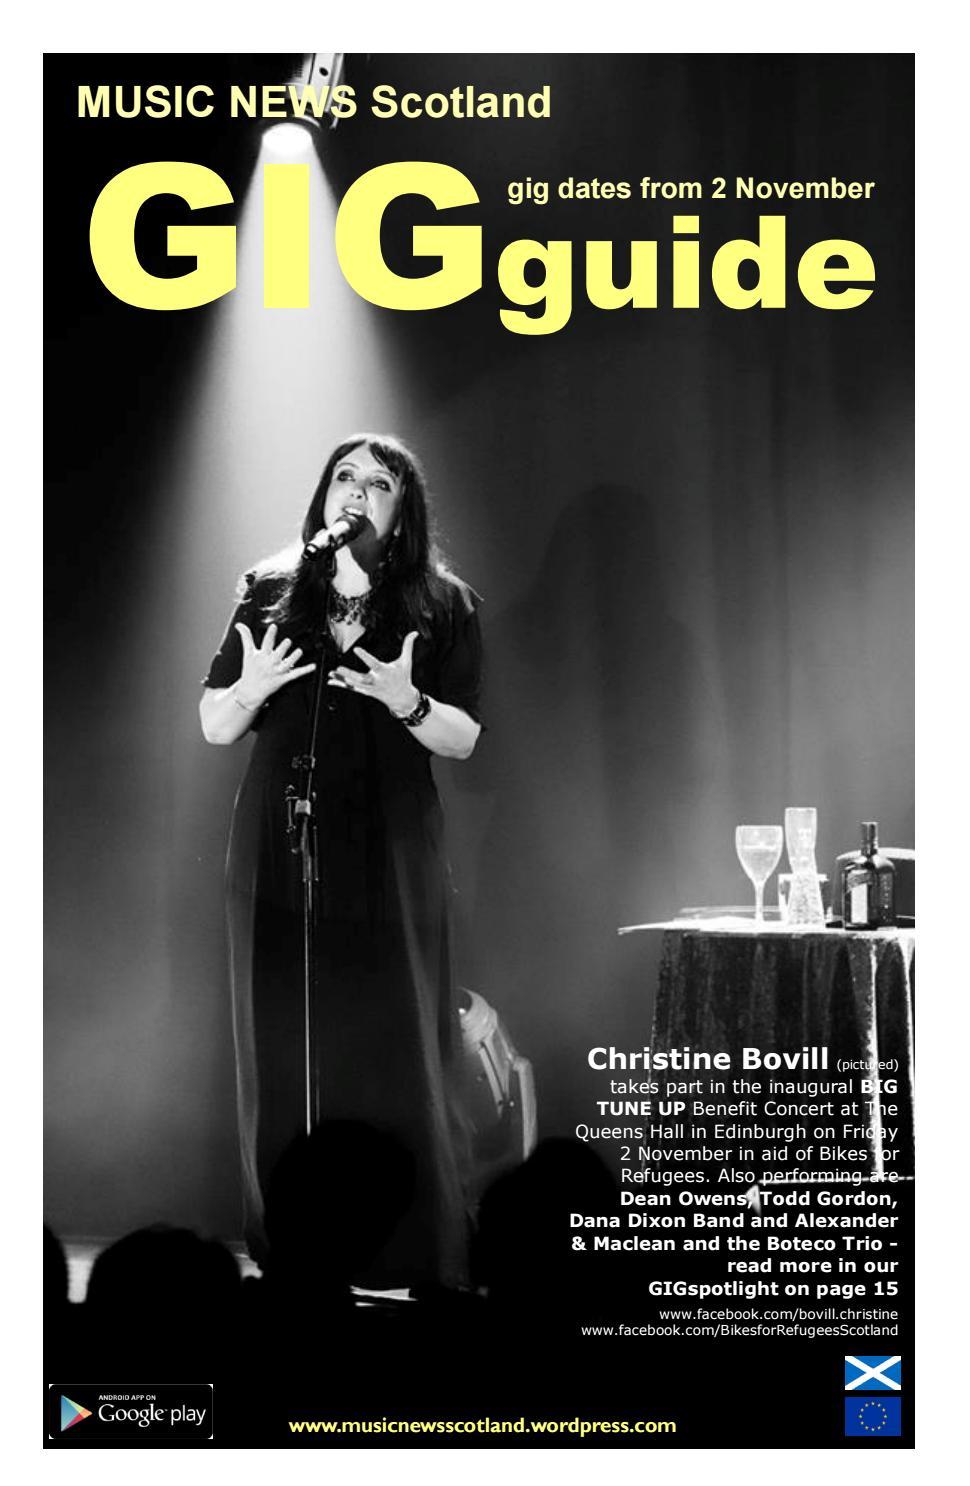 MNS GIGguide by MUSIC NEWS Scotland - issuu